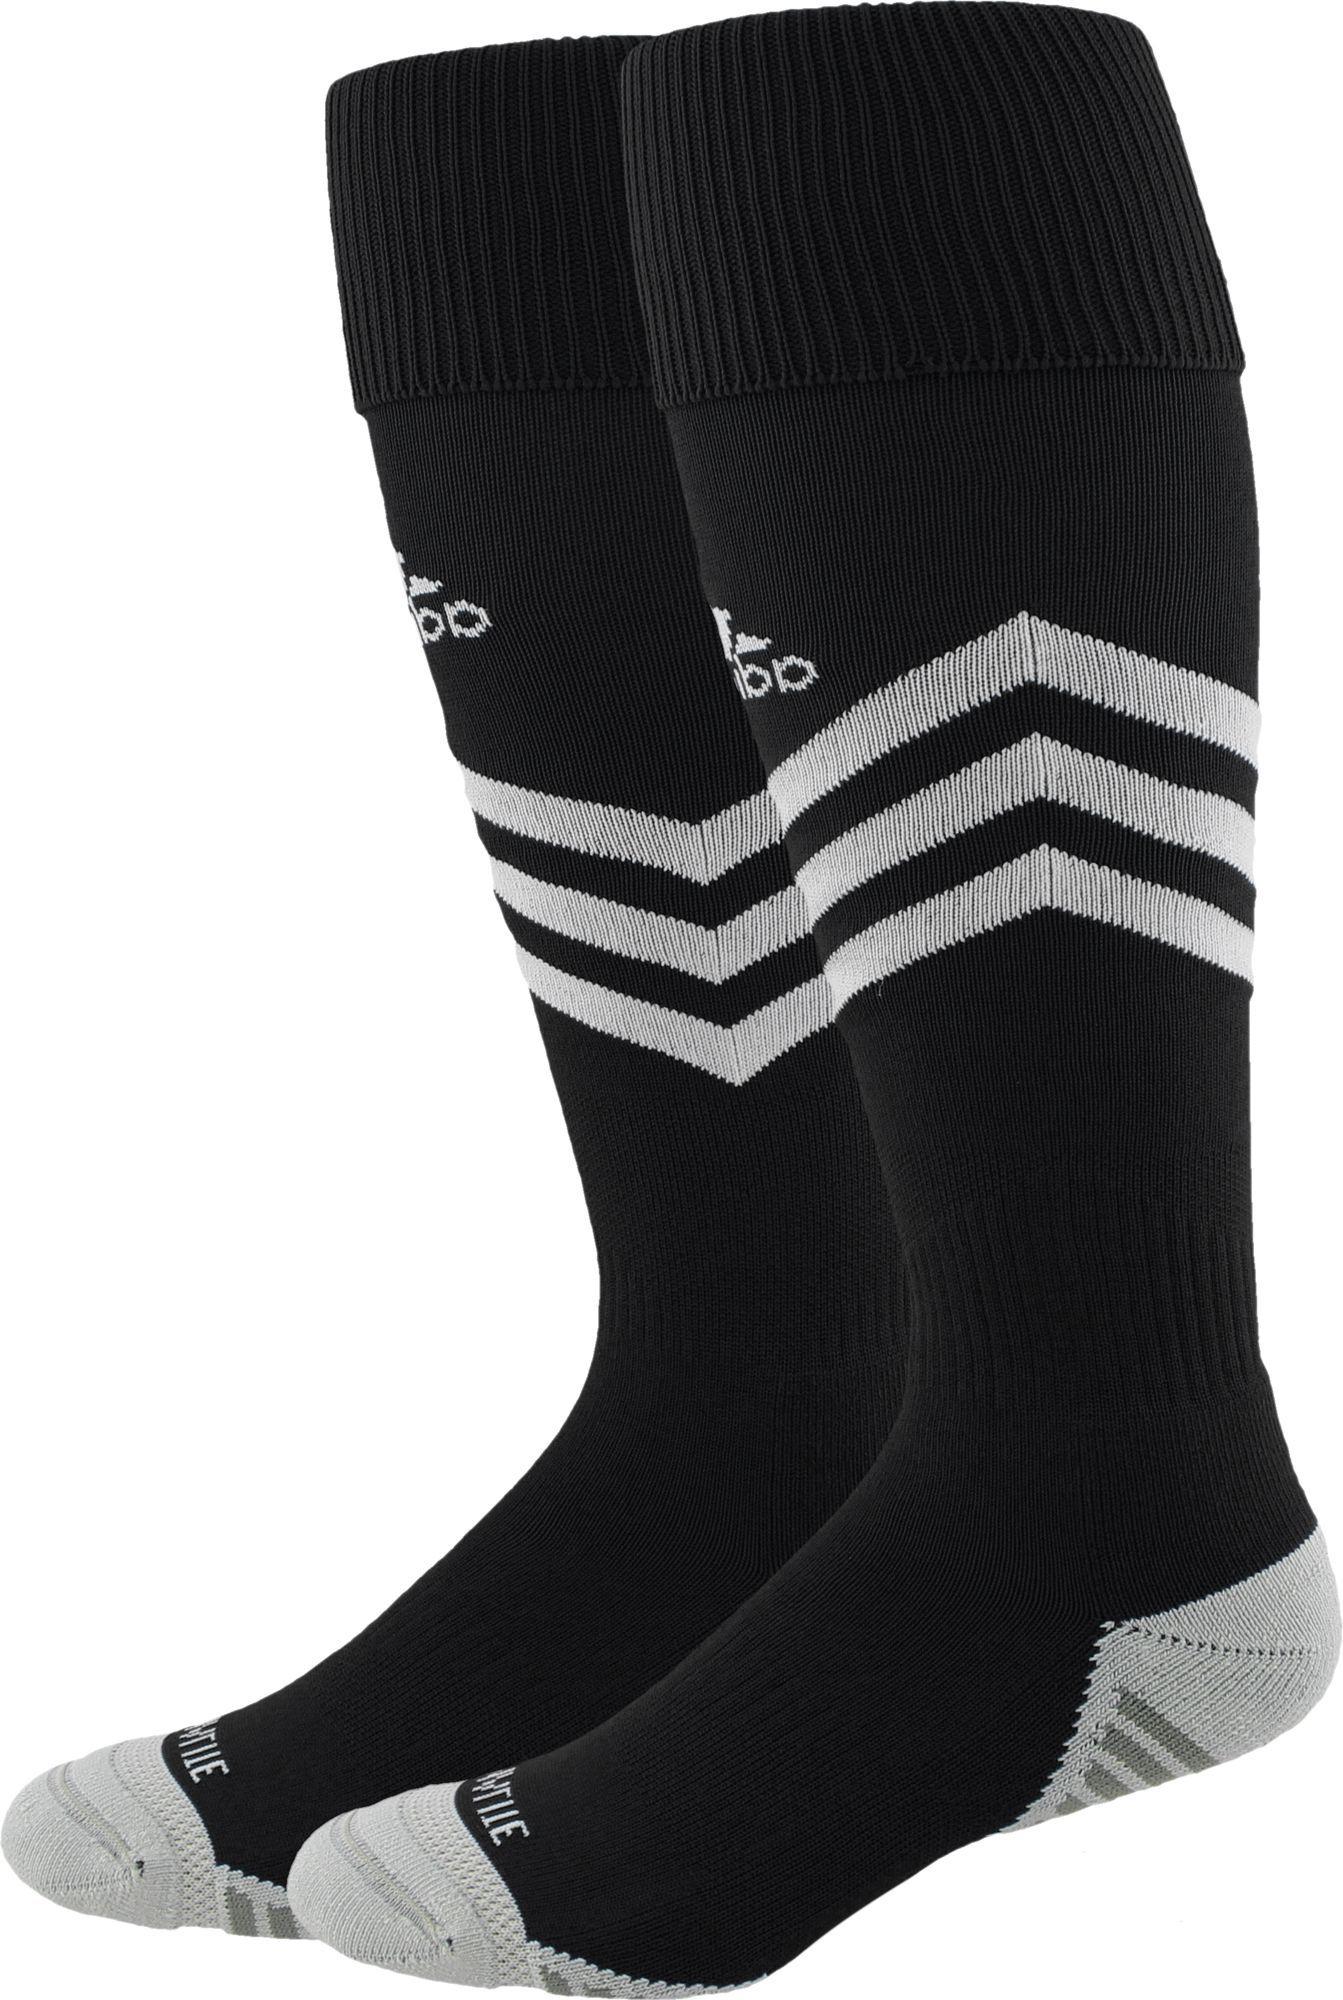 51df99ab5 adidas Mundial Zone Cushion OTC Soccer Socks, Kids Unisex, Size ...